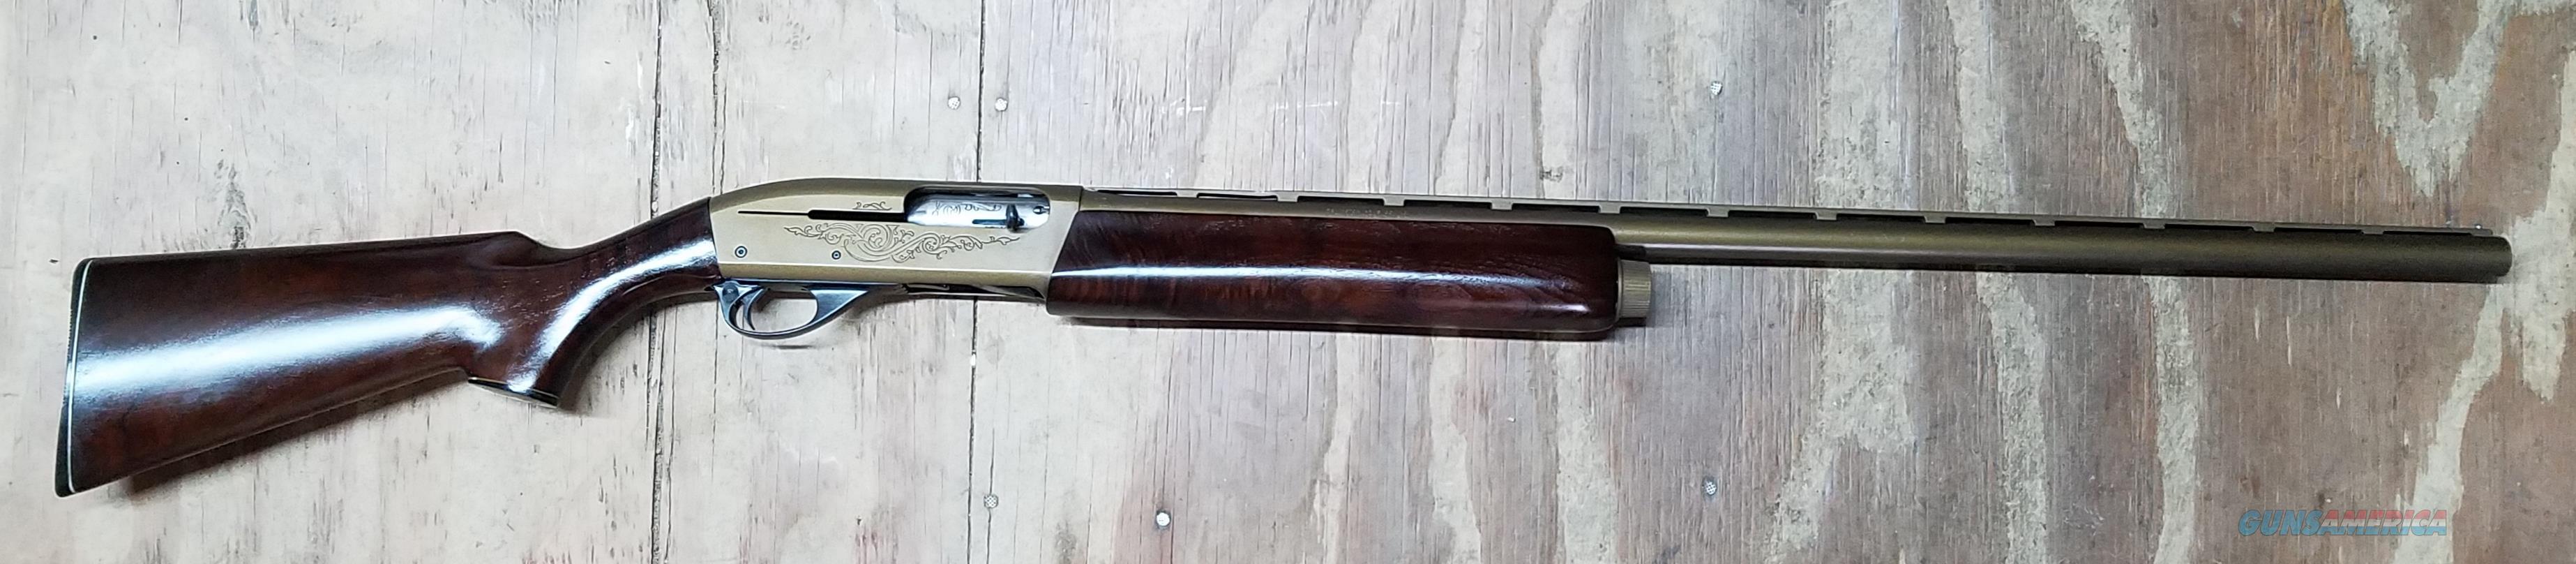 Remington 1100 Full Choke 12 Ga Shotgun for 2 3/4 Shells  Guns > Shotguns > Remington Shotguns  > Single Barrel